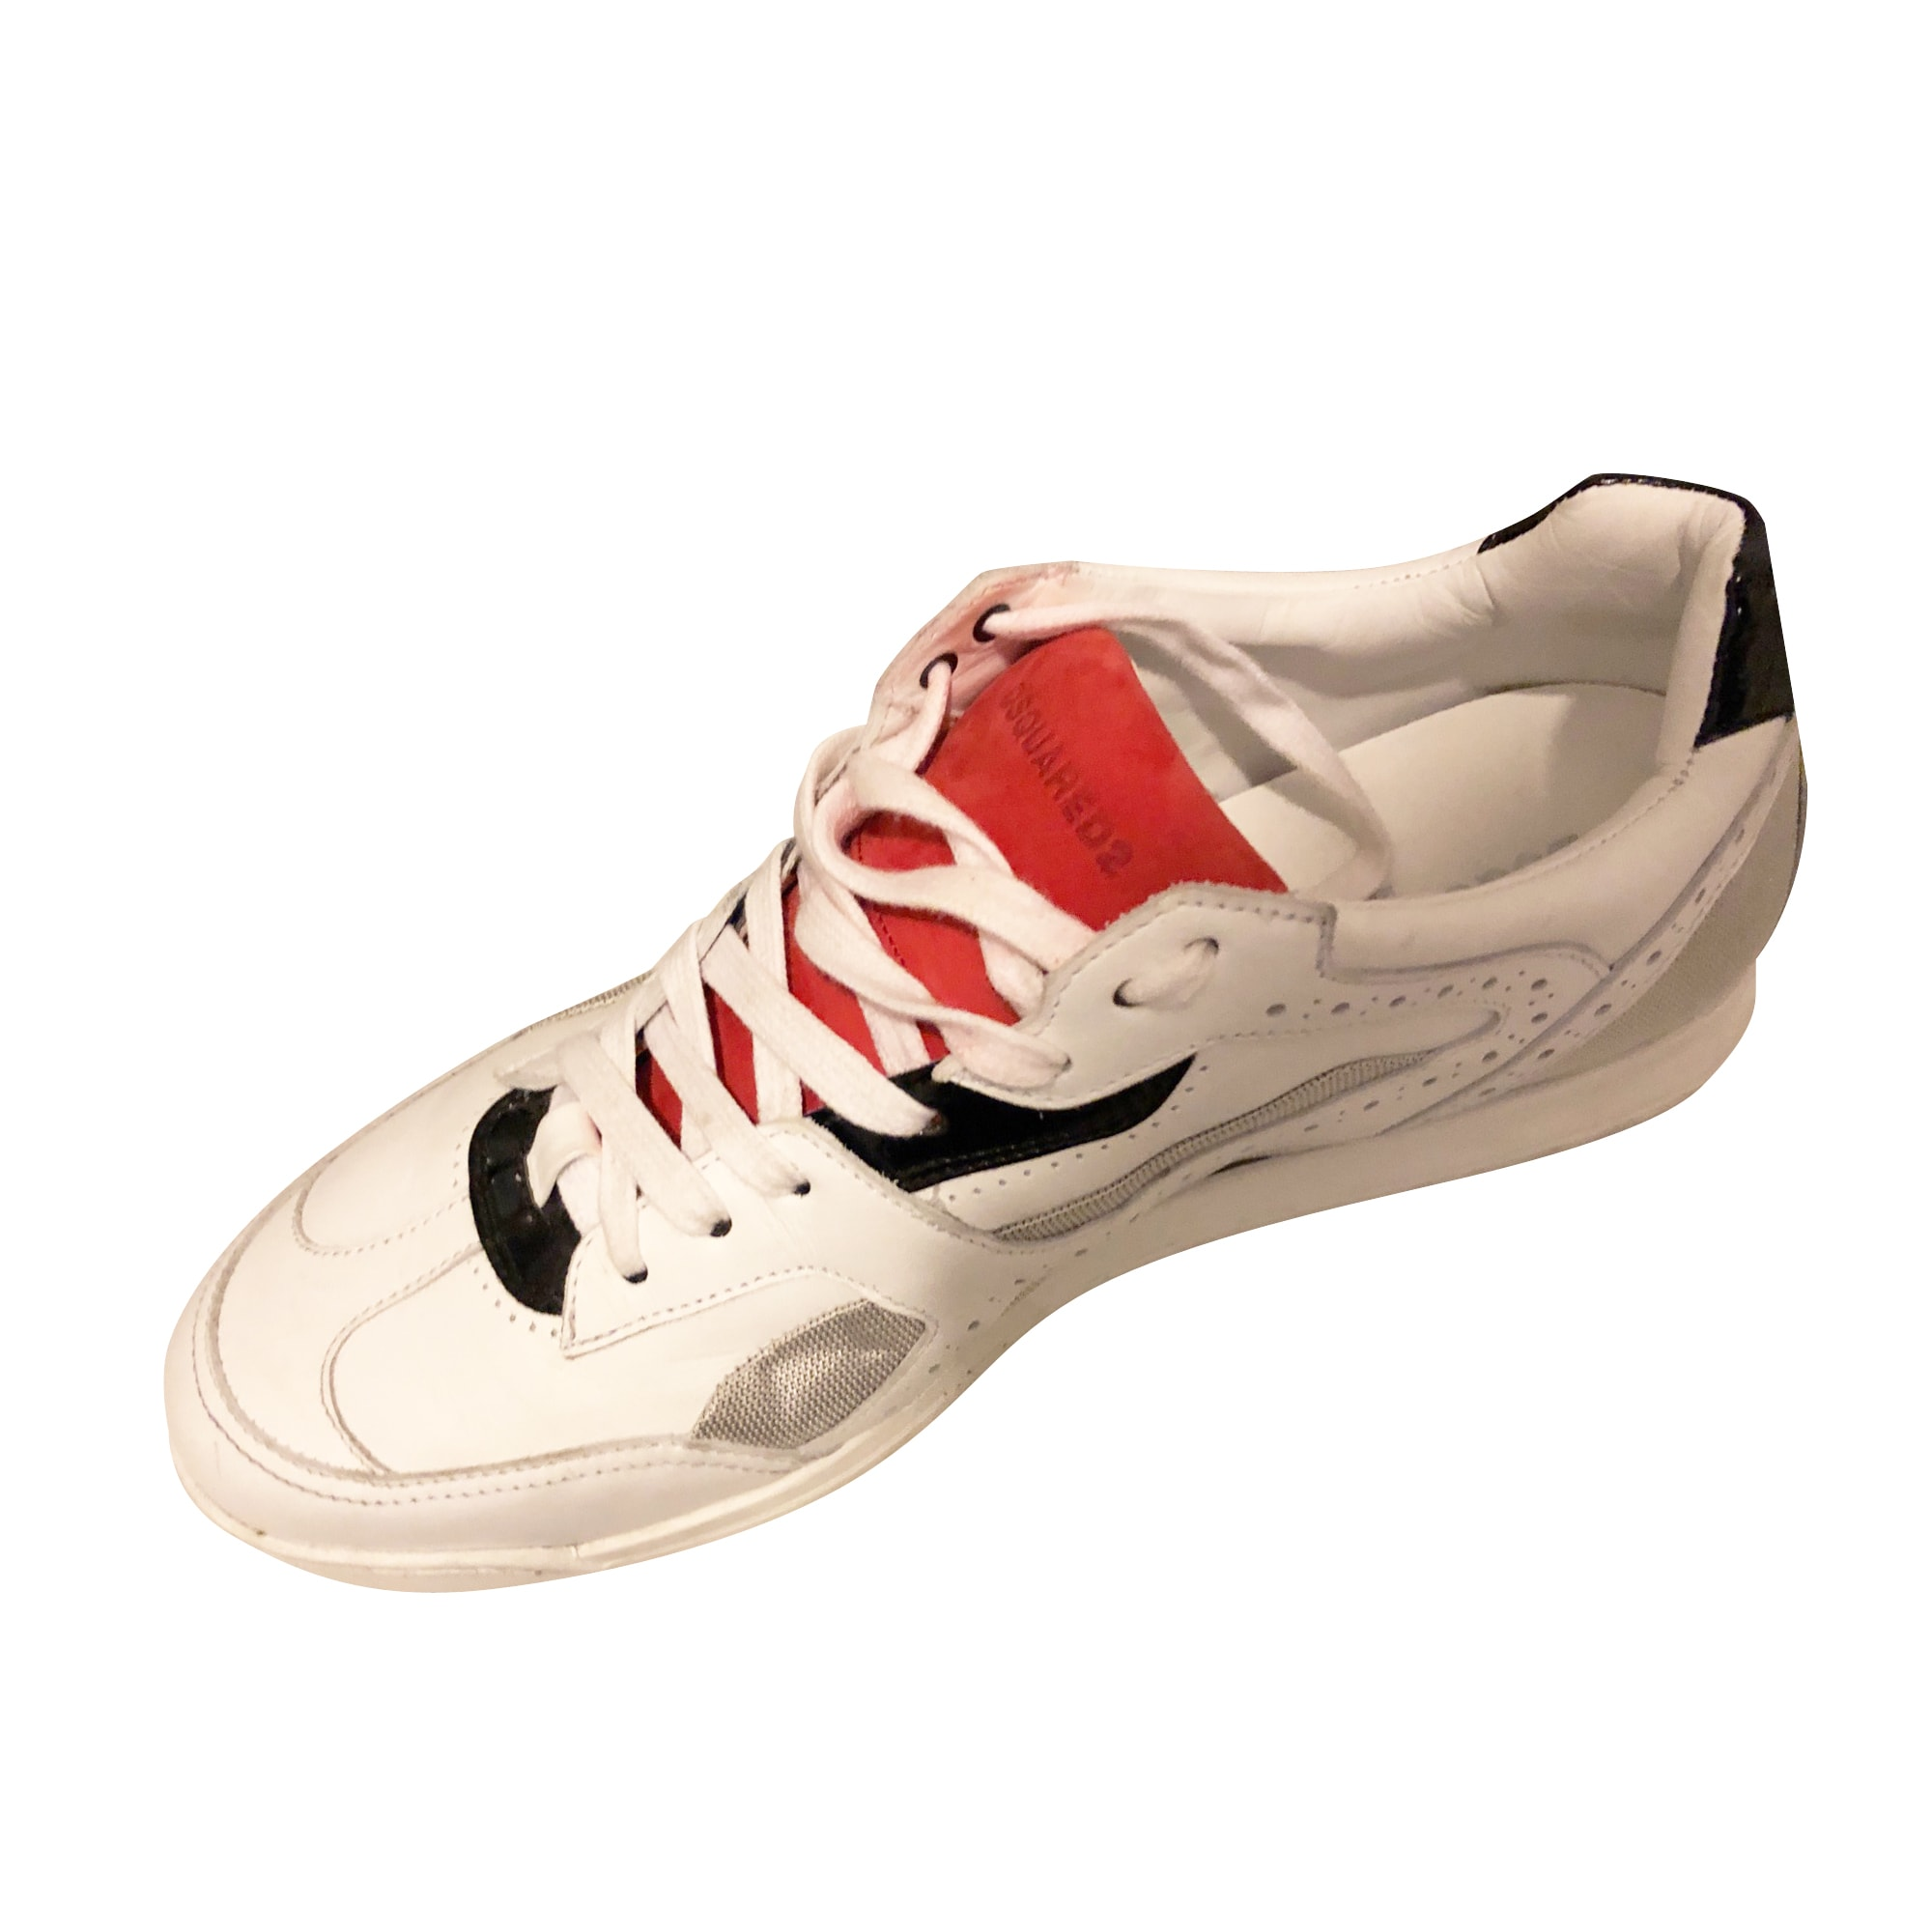 Scarpe da tennis DSQUARED2 Argentato, acciaio